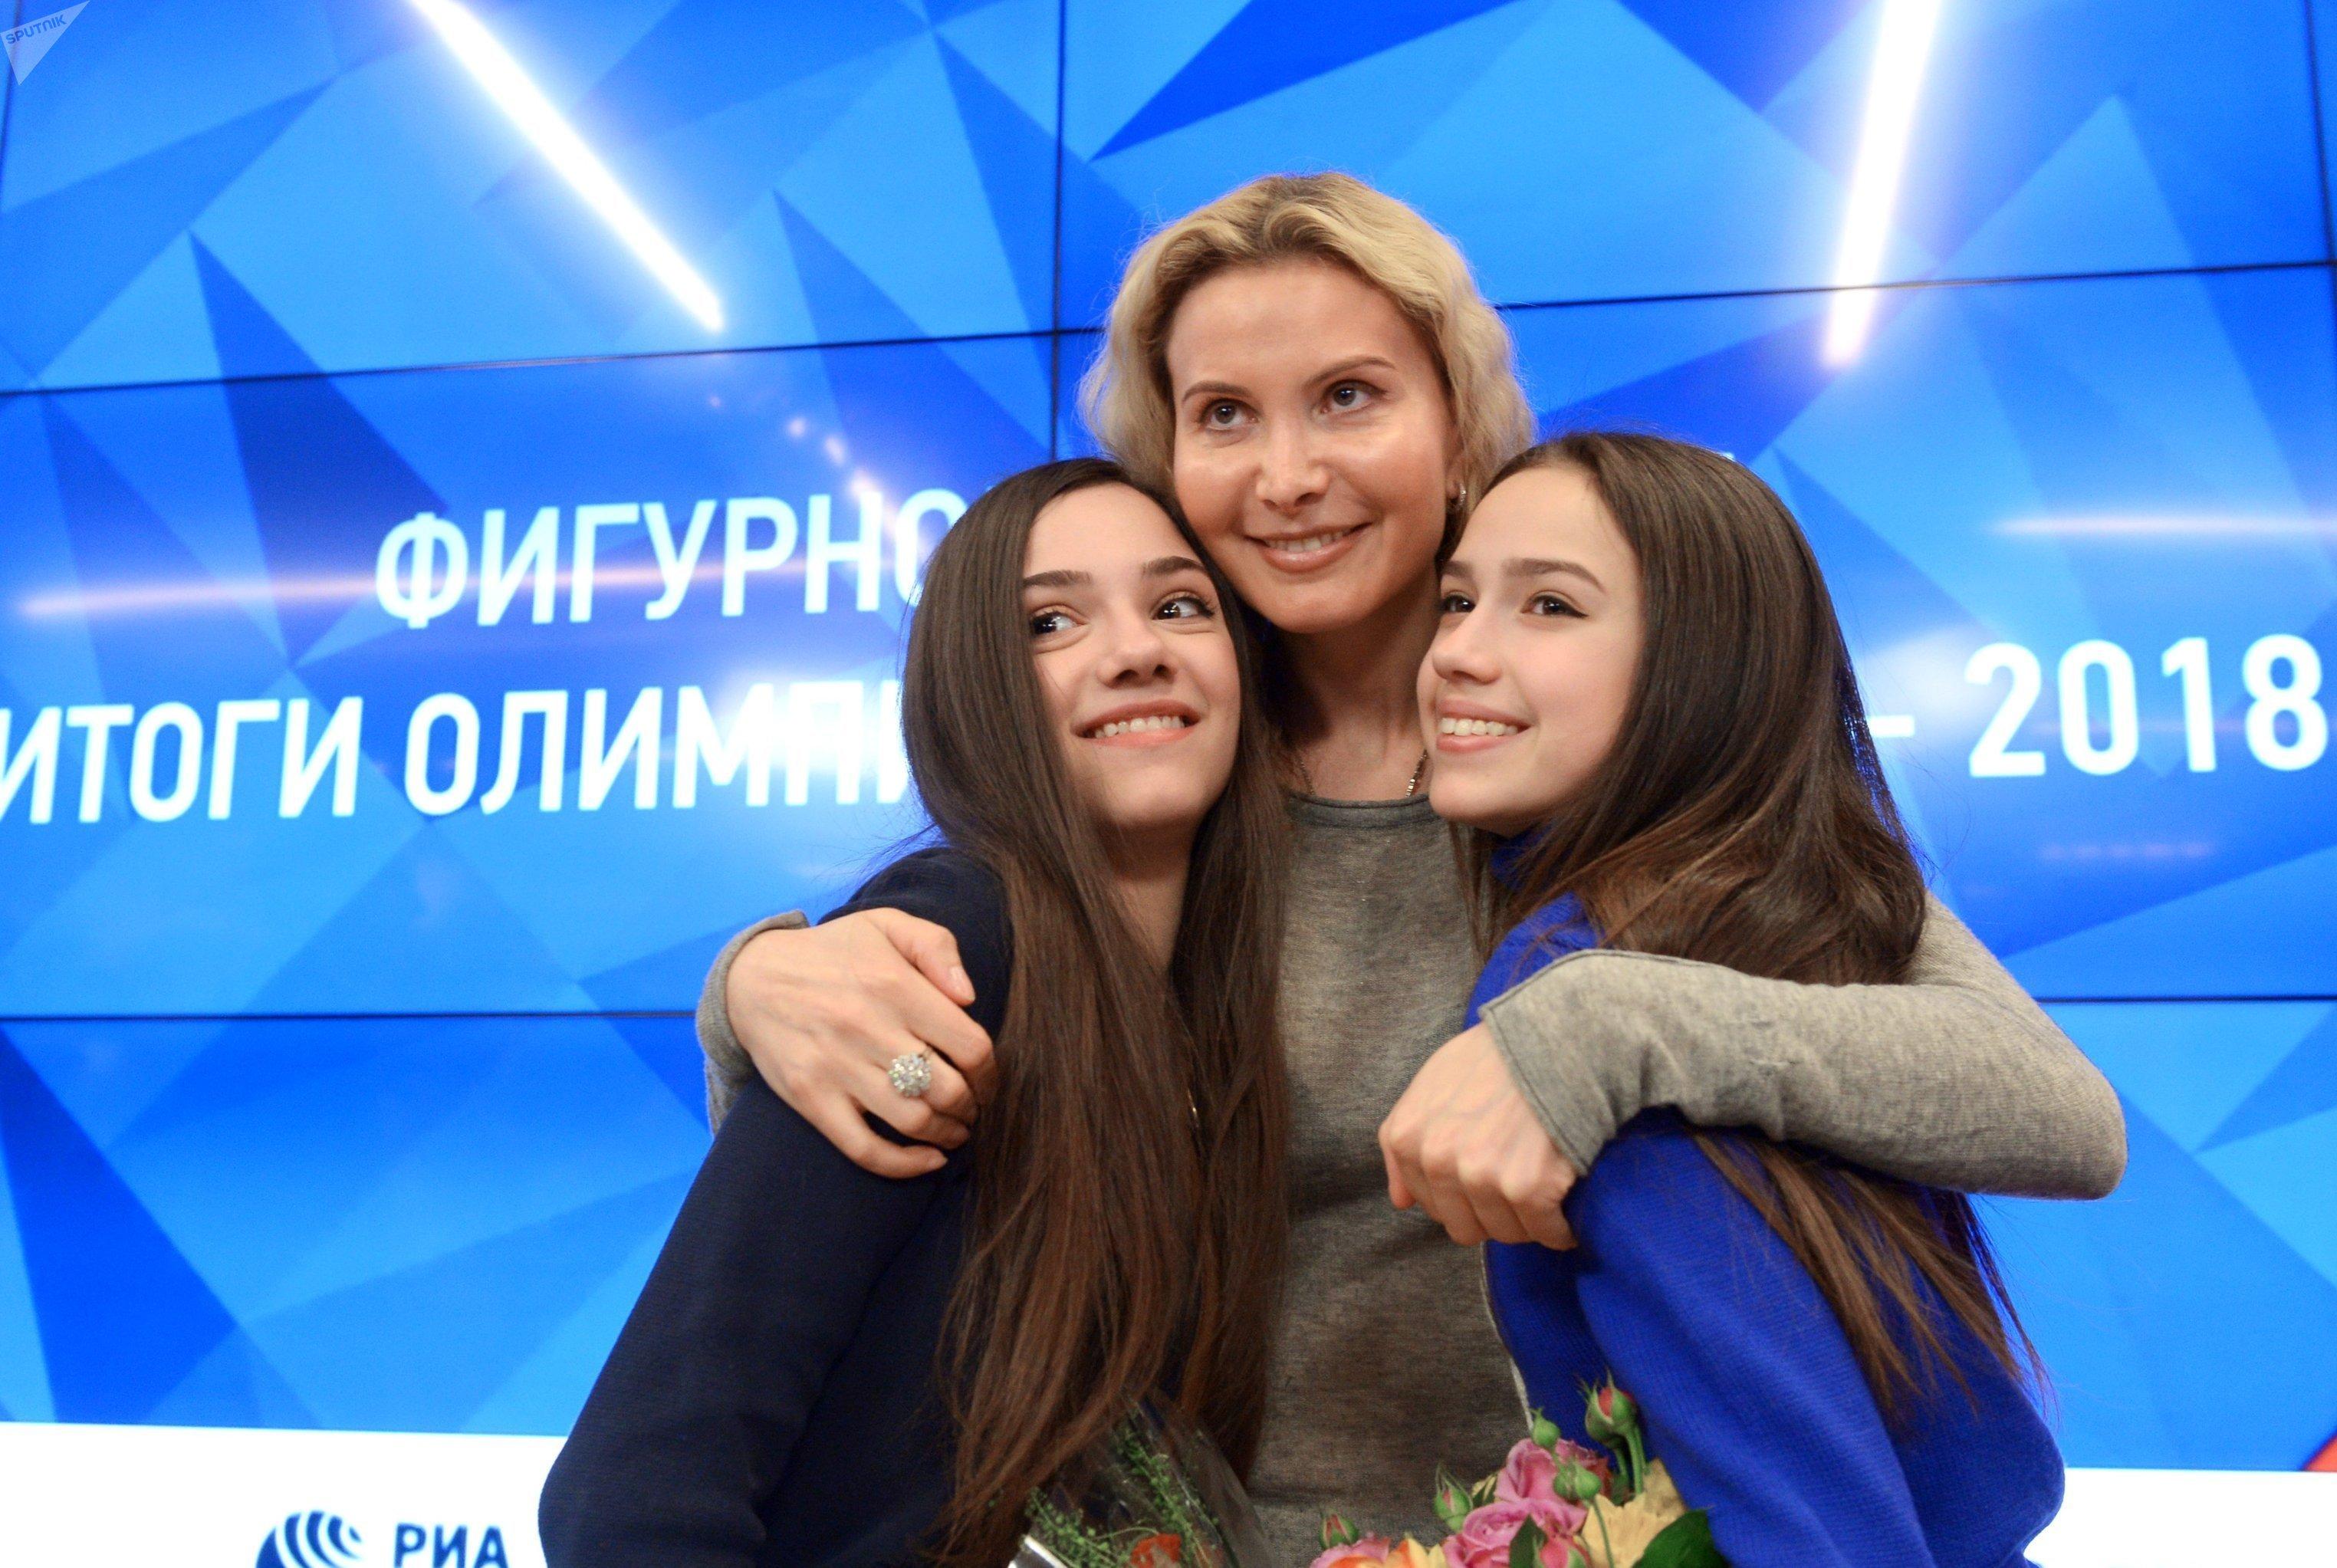 Eteri Tutberidze con sus alumnas Alina Zaguítova y Evguenia Medvédeva